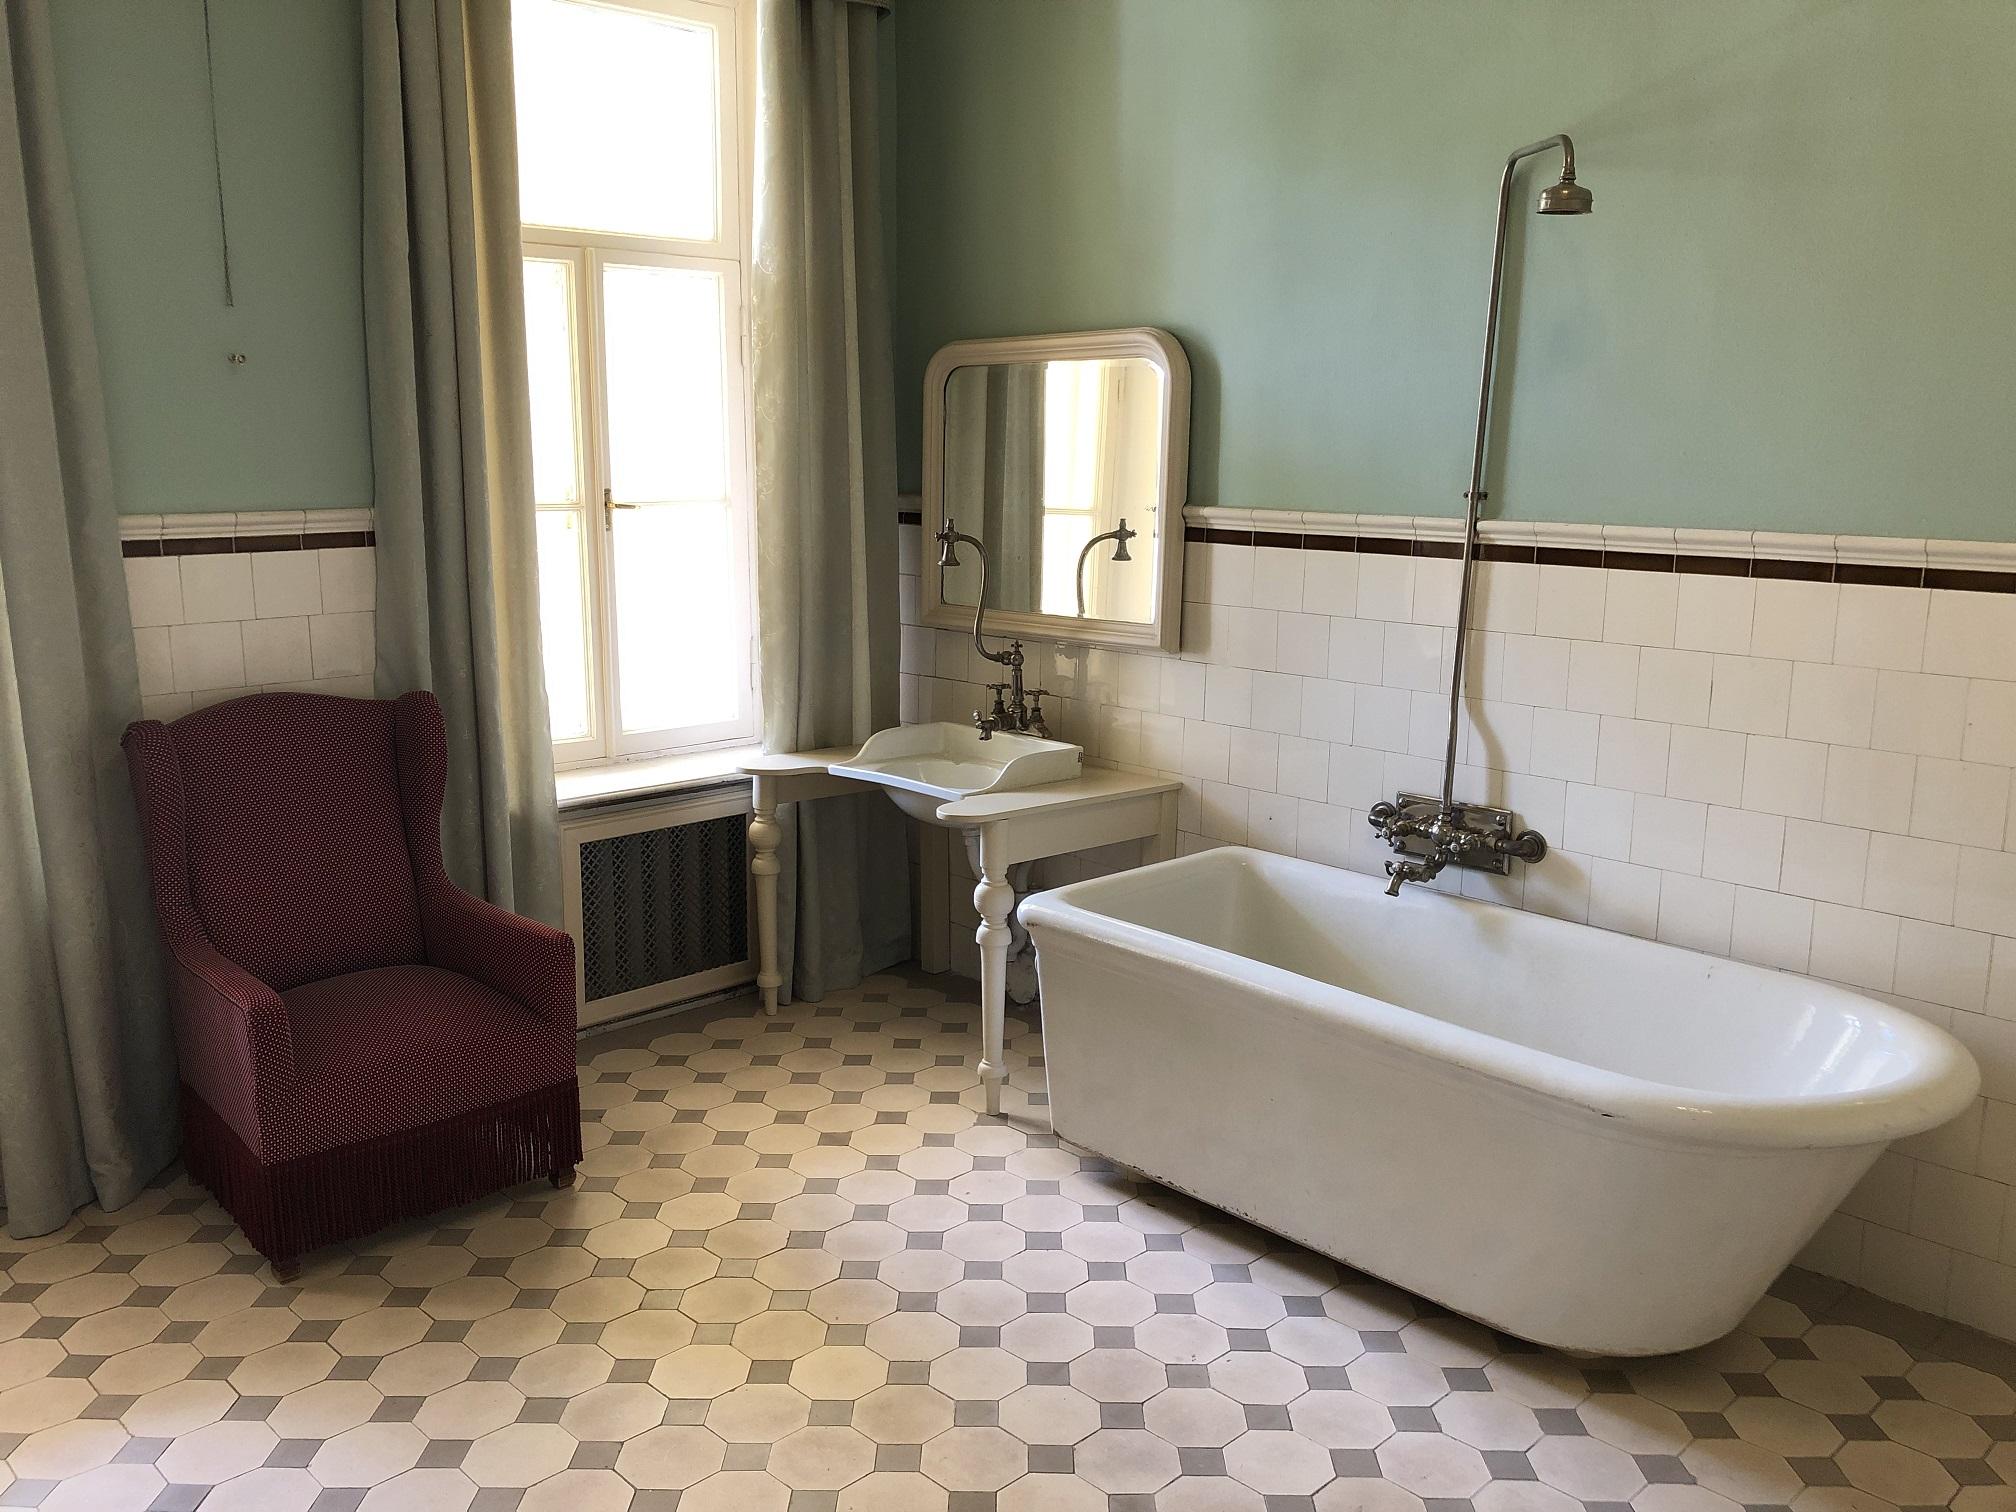 Ett av badrummen i herrgården